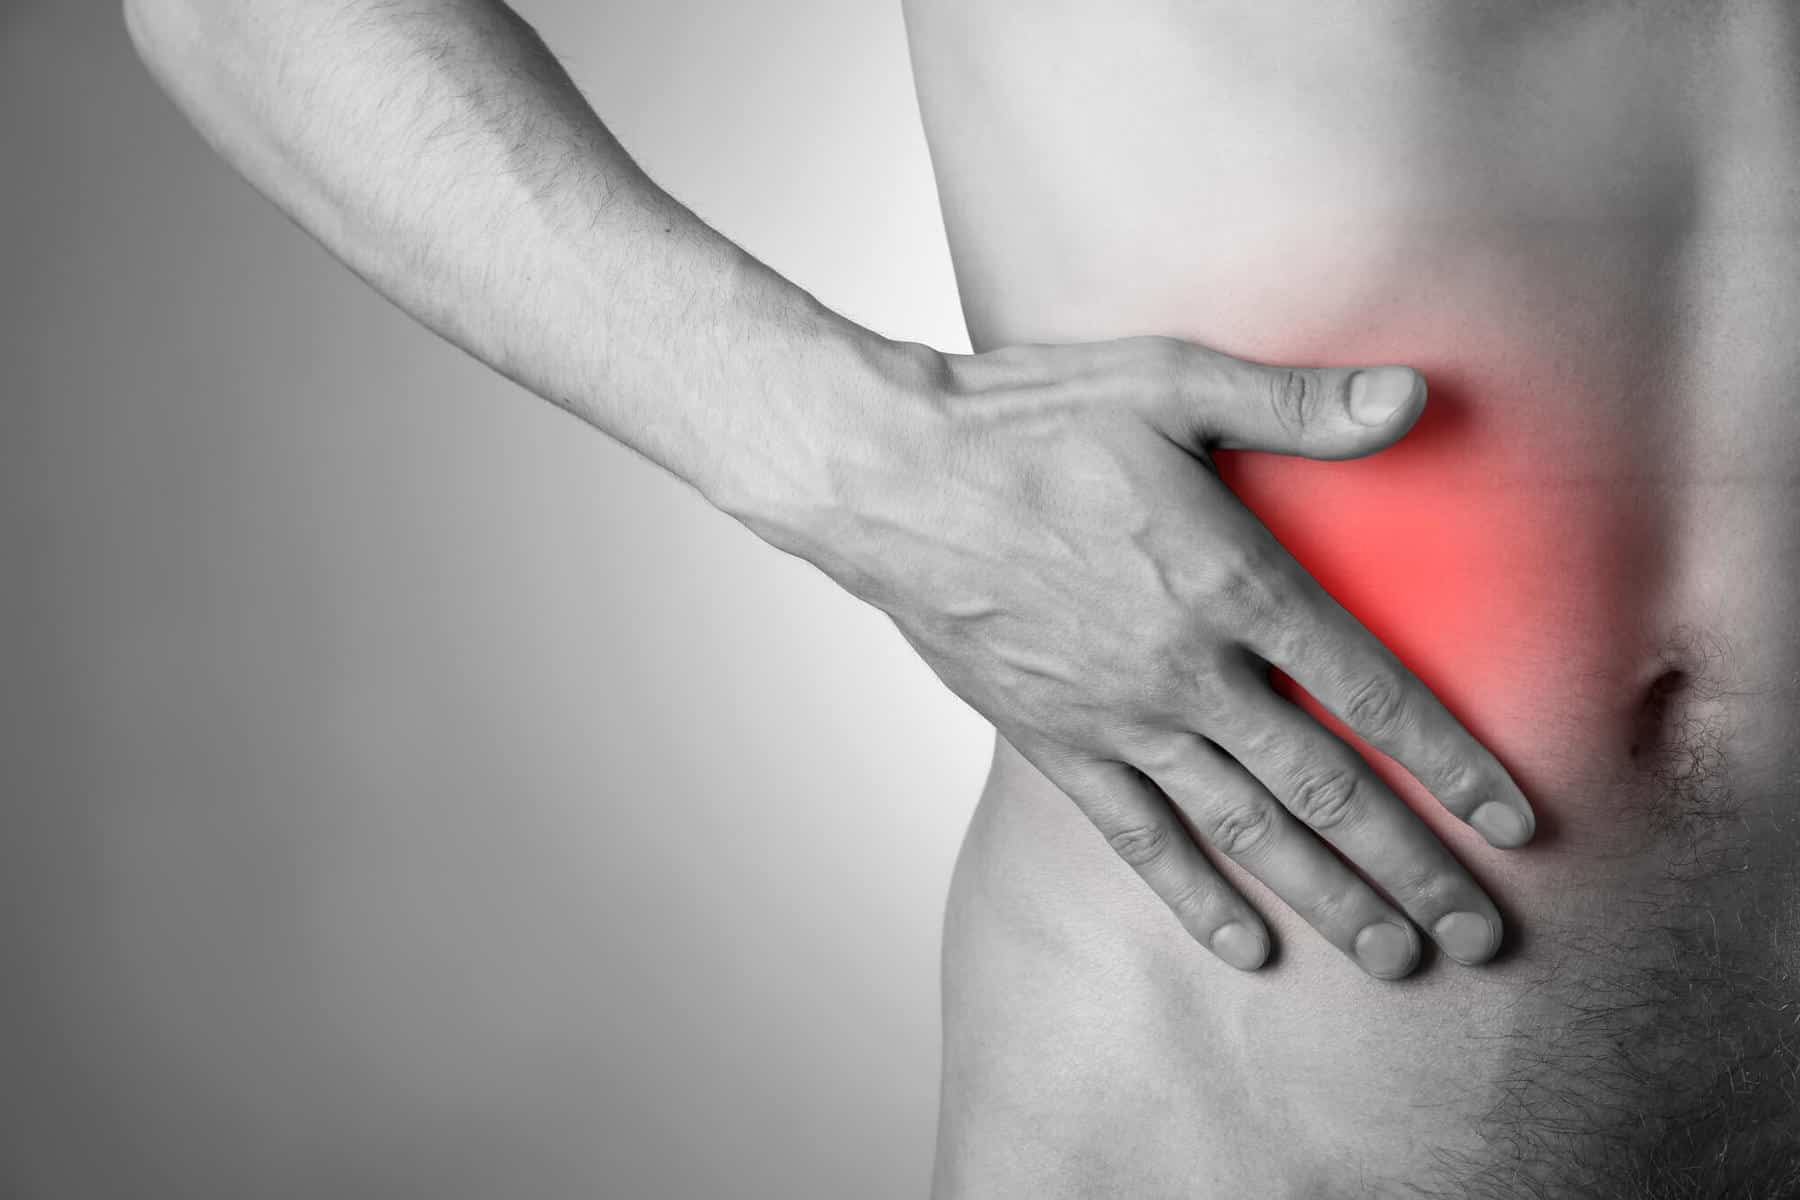 Liver or Gallbladder Issues